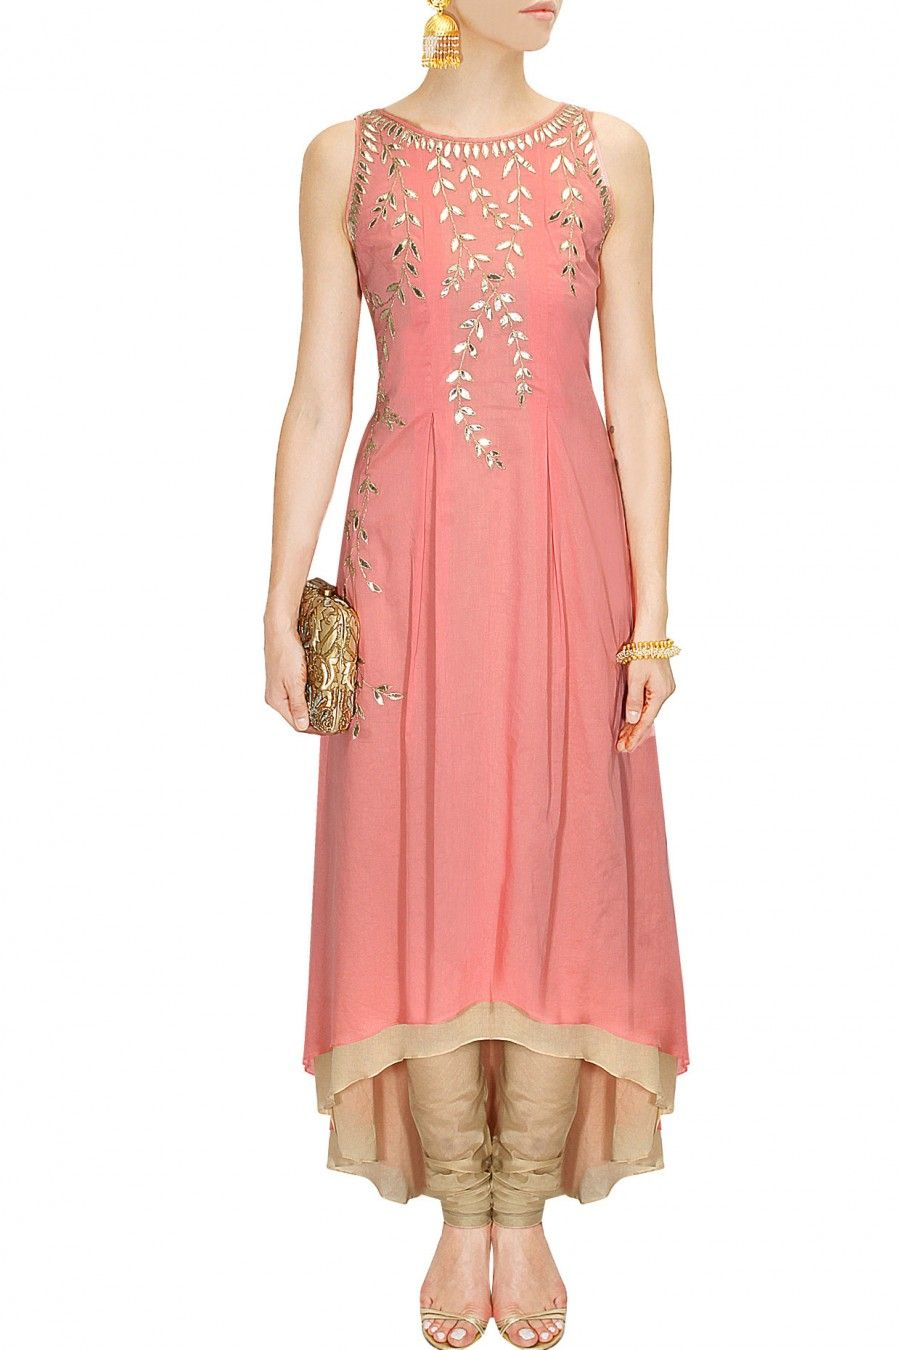 Fashion salwar kameez designs dresses pinterest lakme fashion